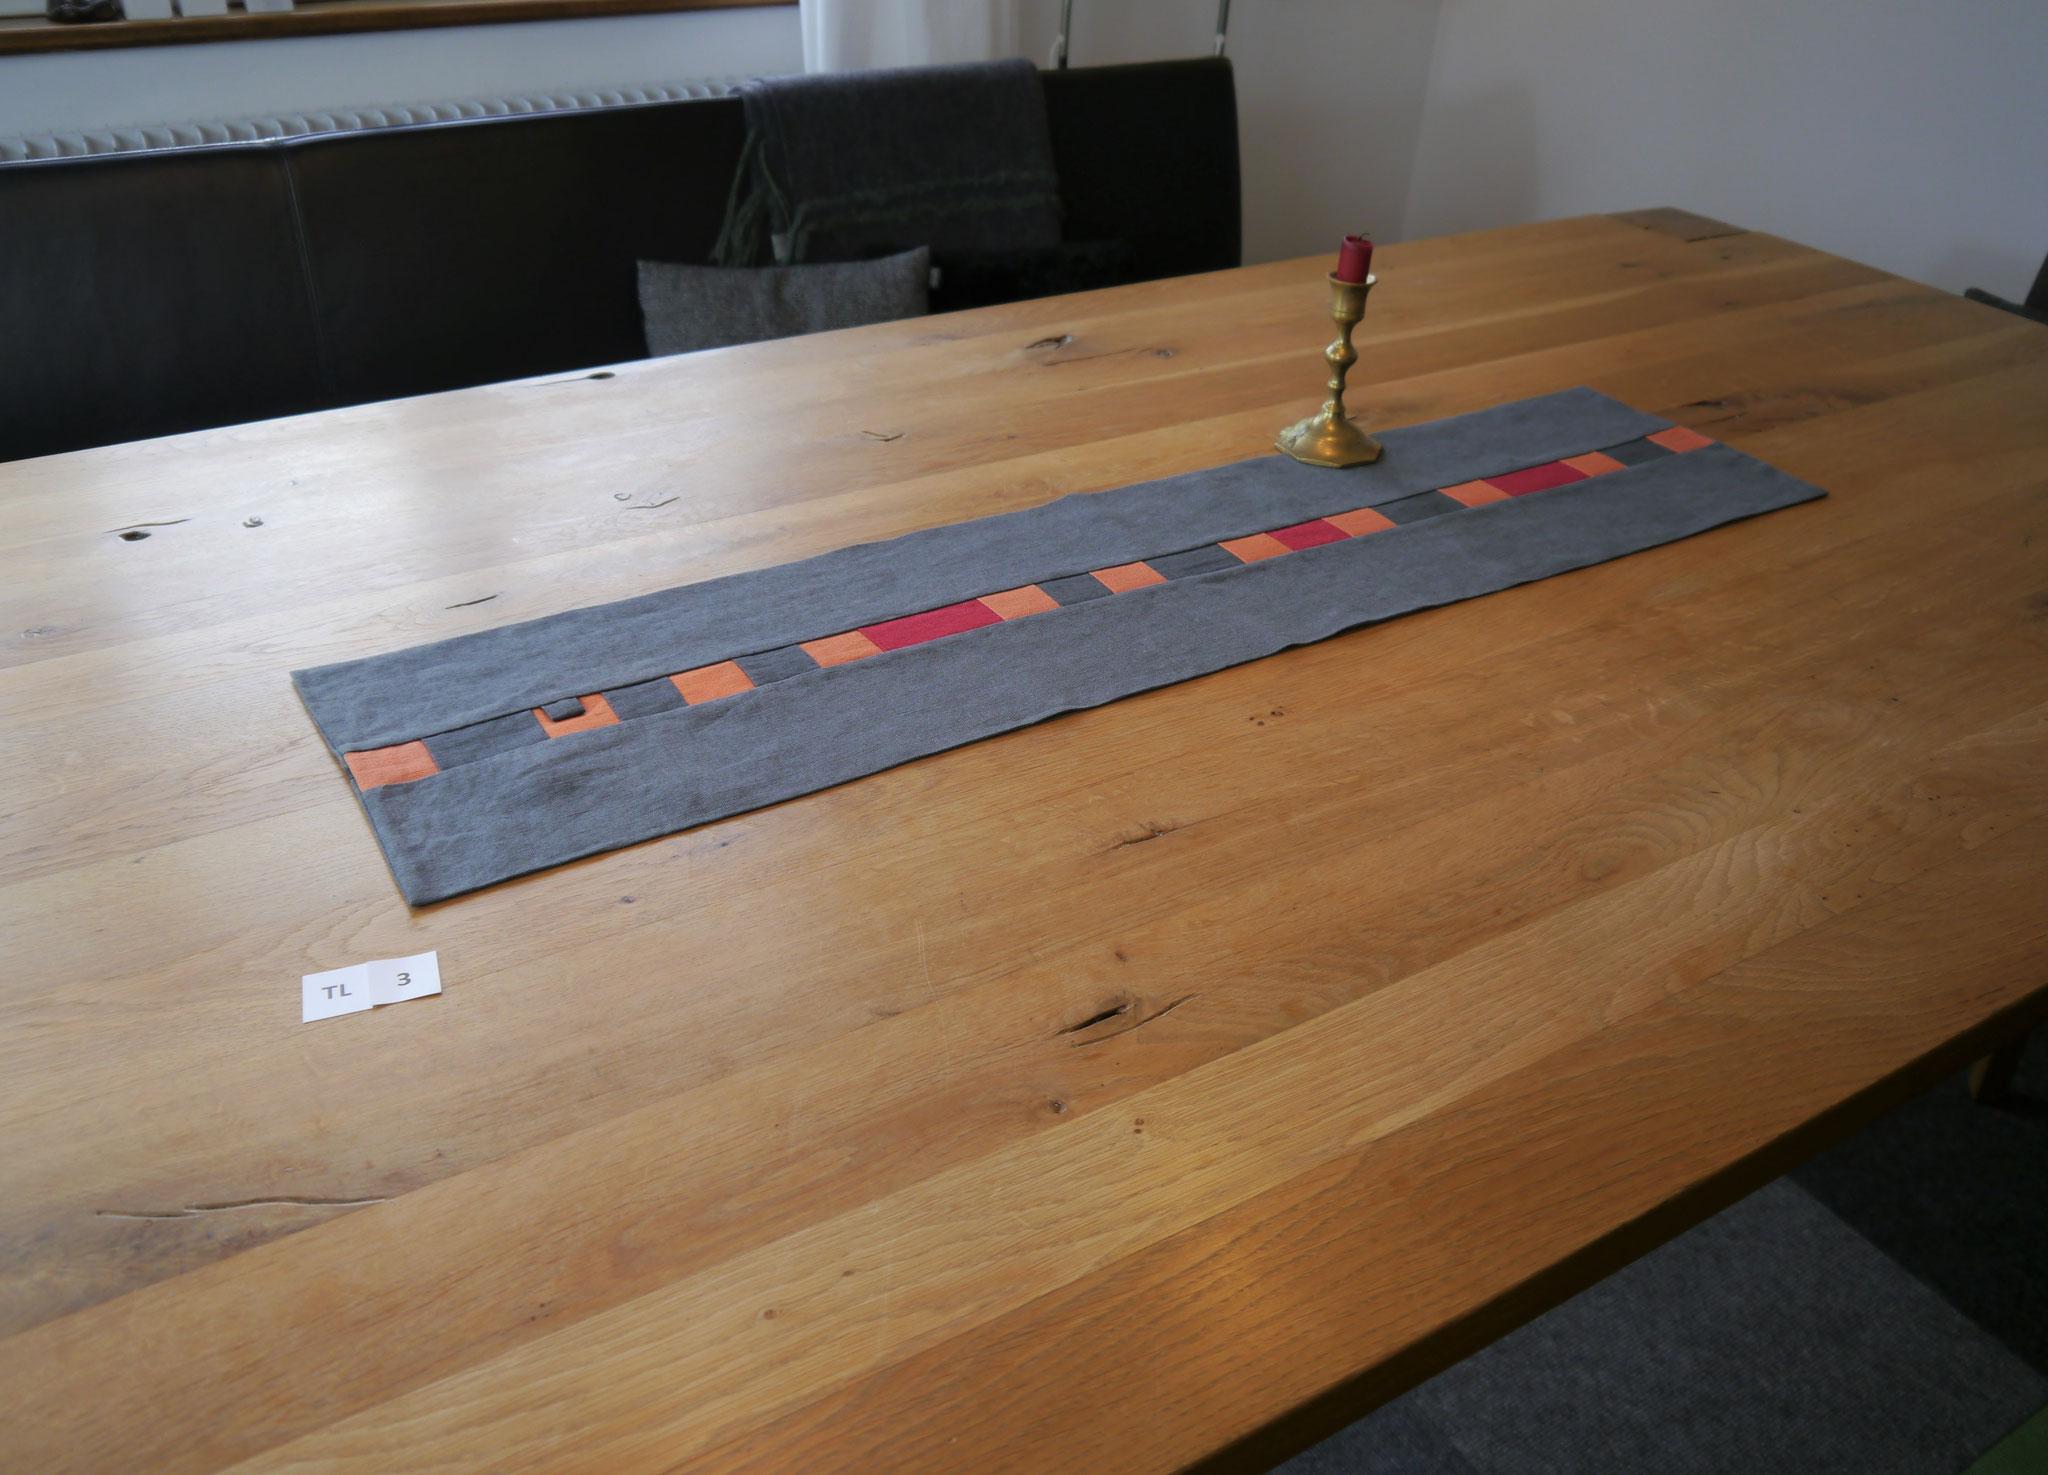 TL 3: 100 x 23 cm * Leinen * 44,90 €